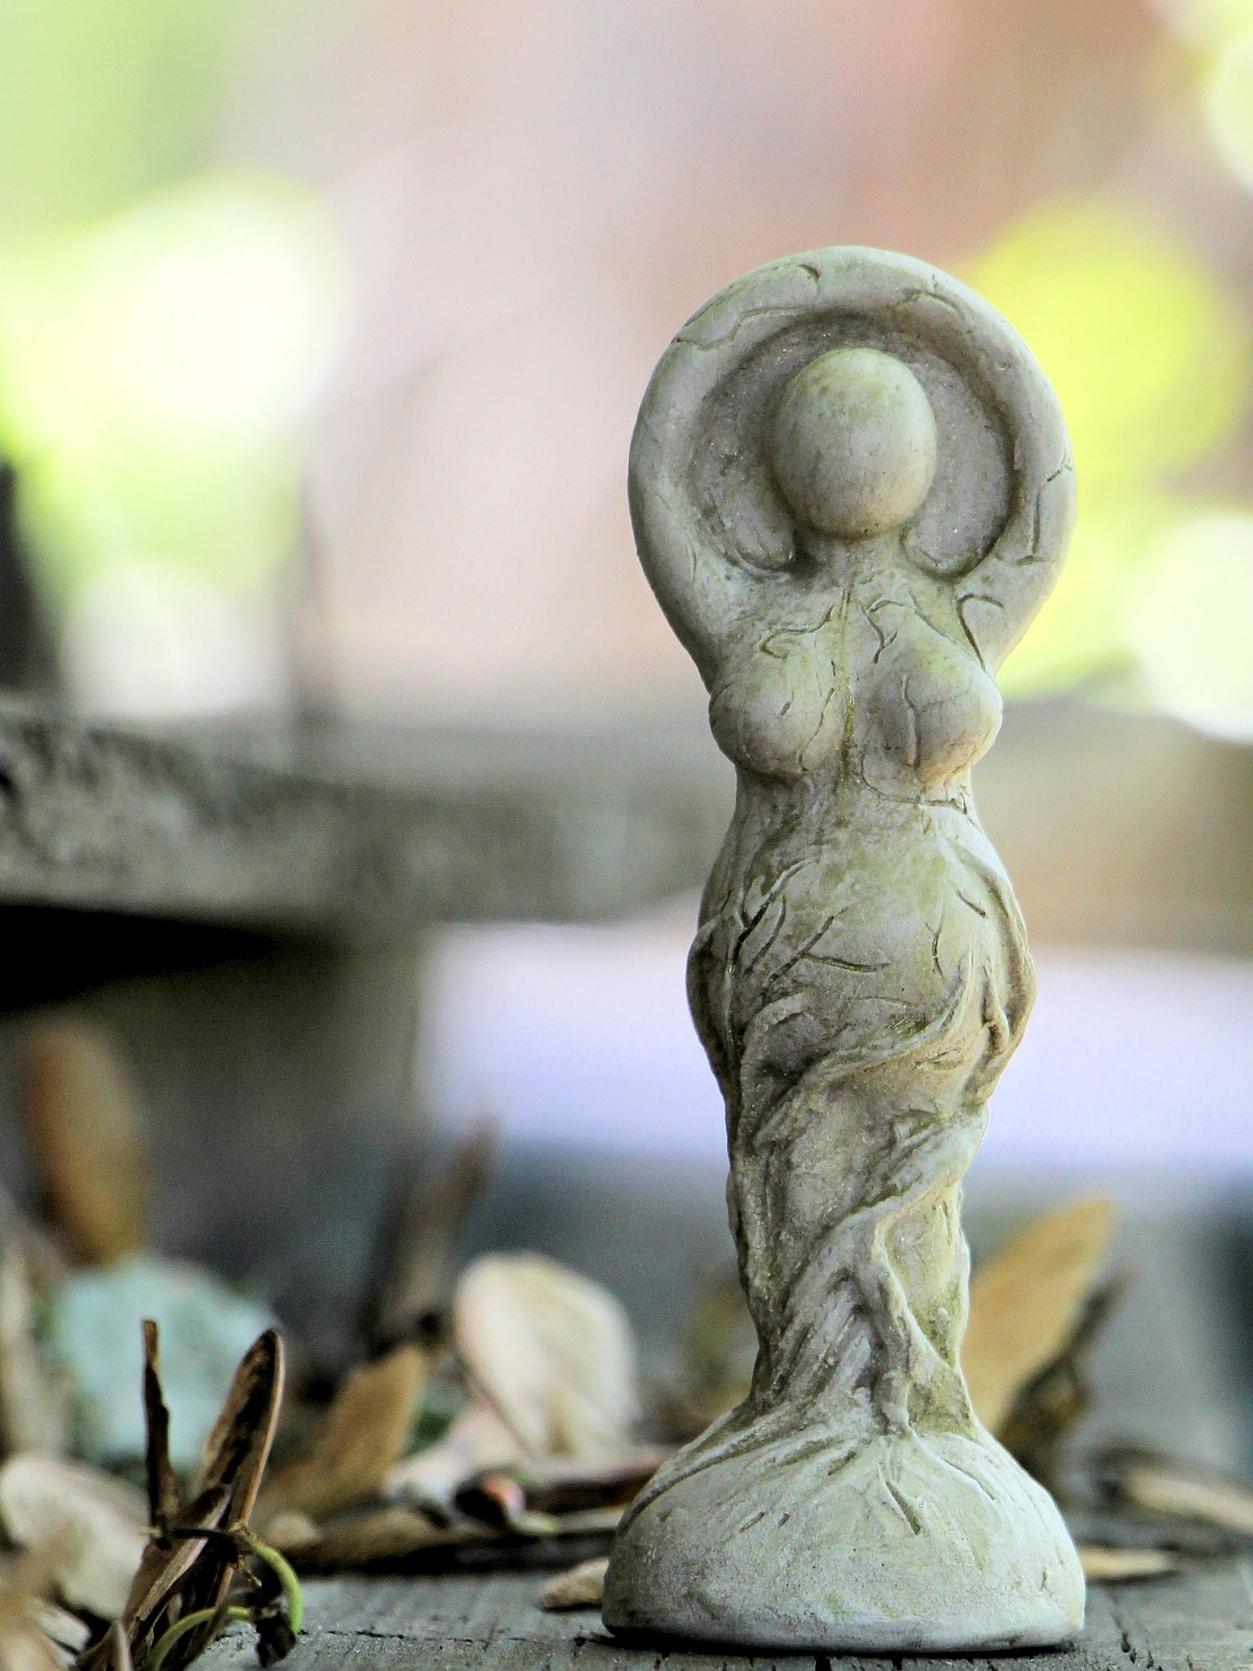 statue-1405539_1920.jpg